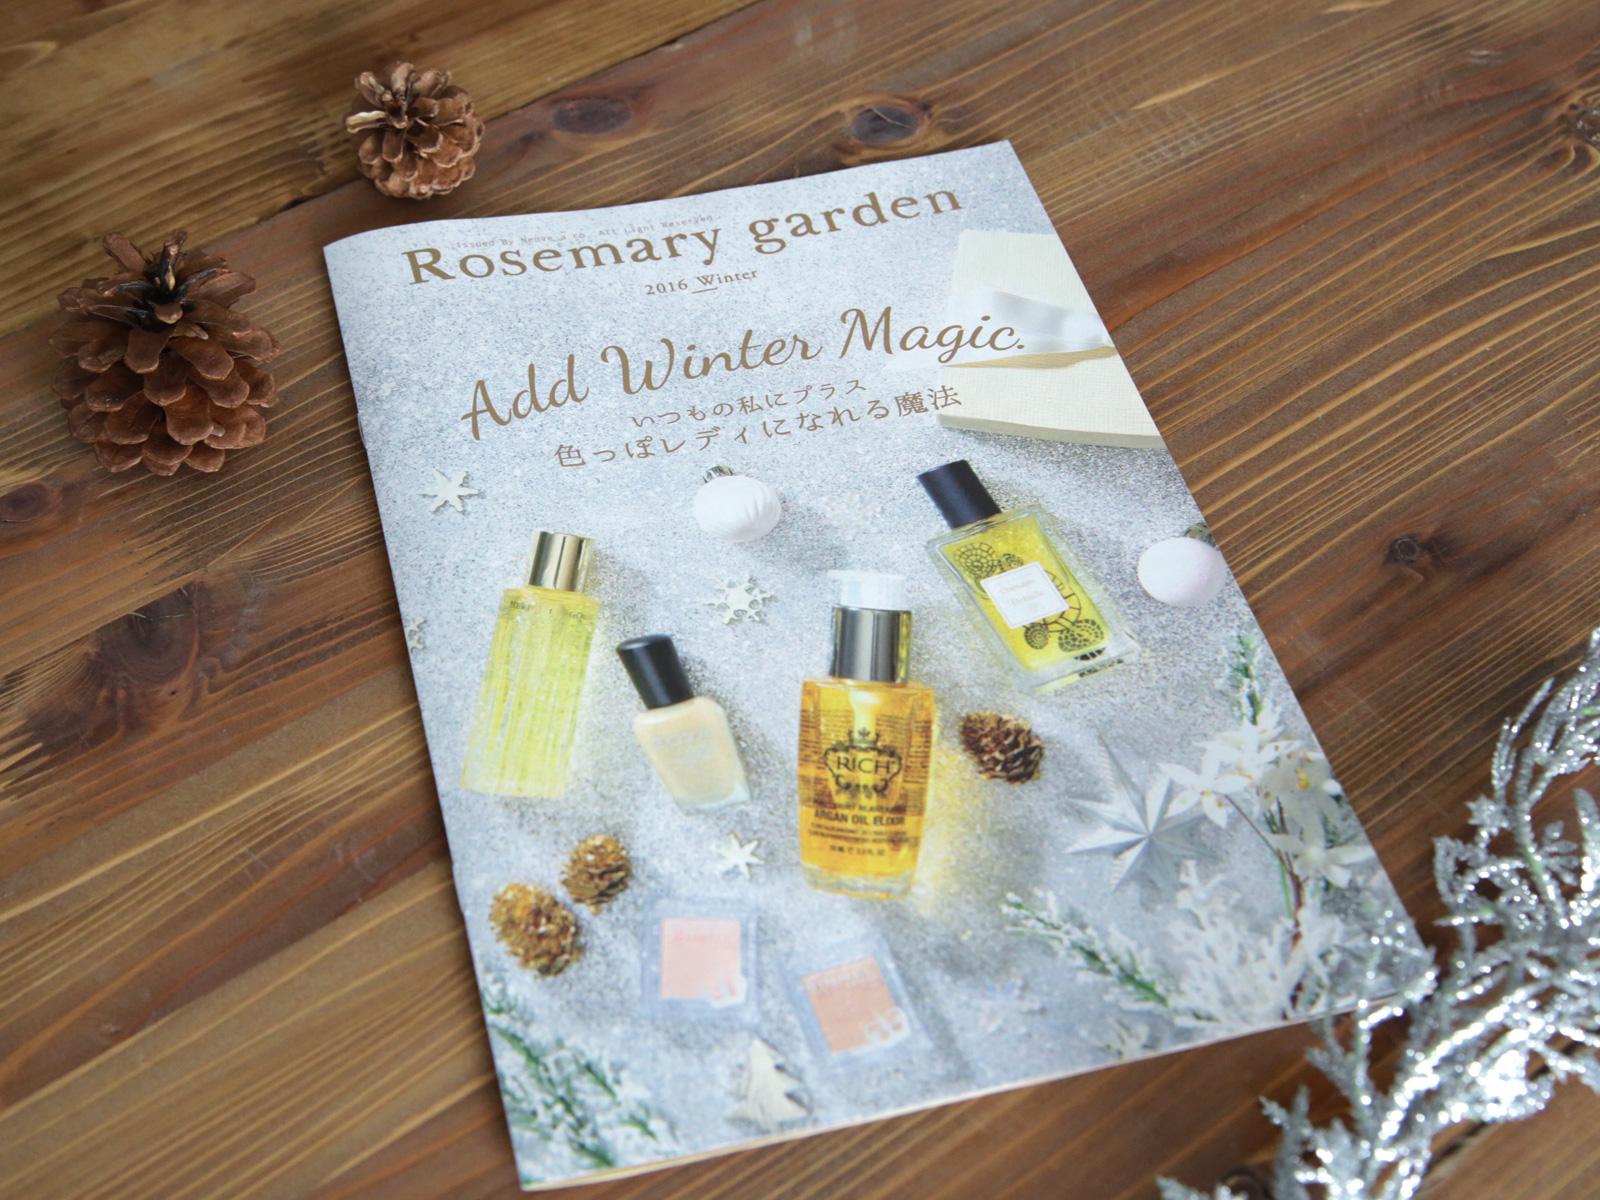 works rosemary garden16wi 1 ローズマリー 2016冬カタログ